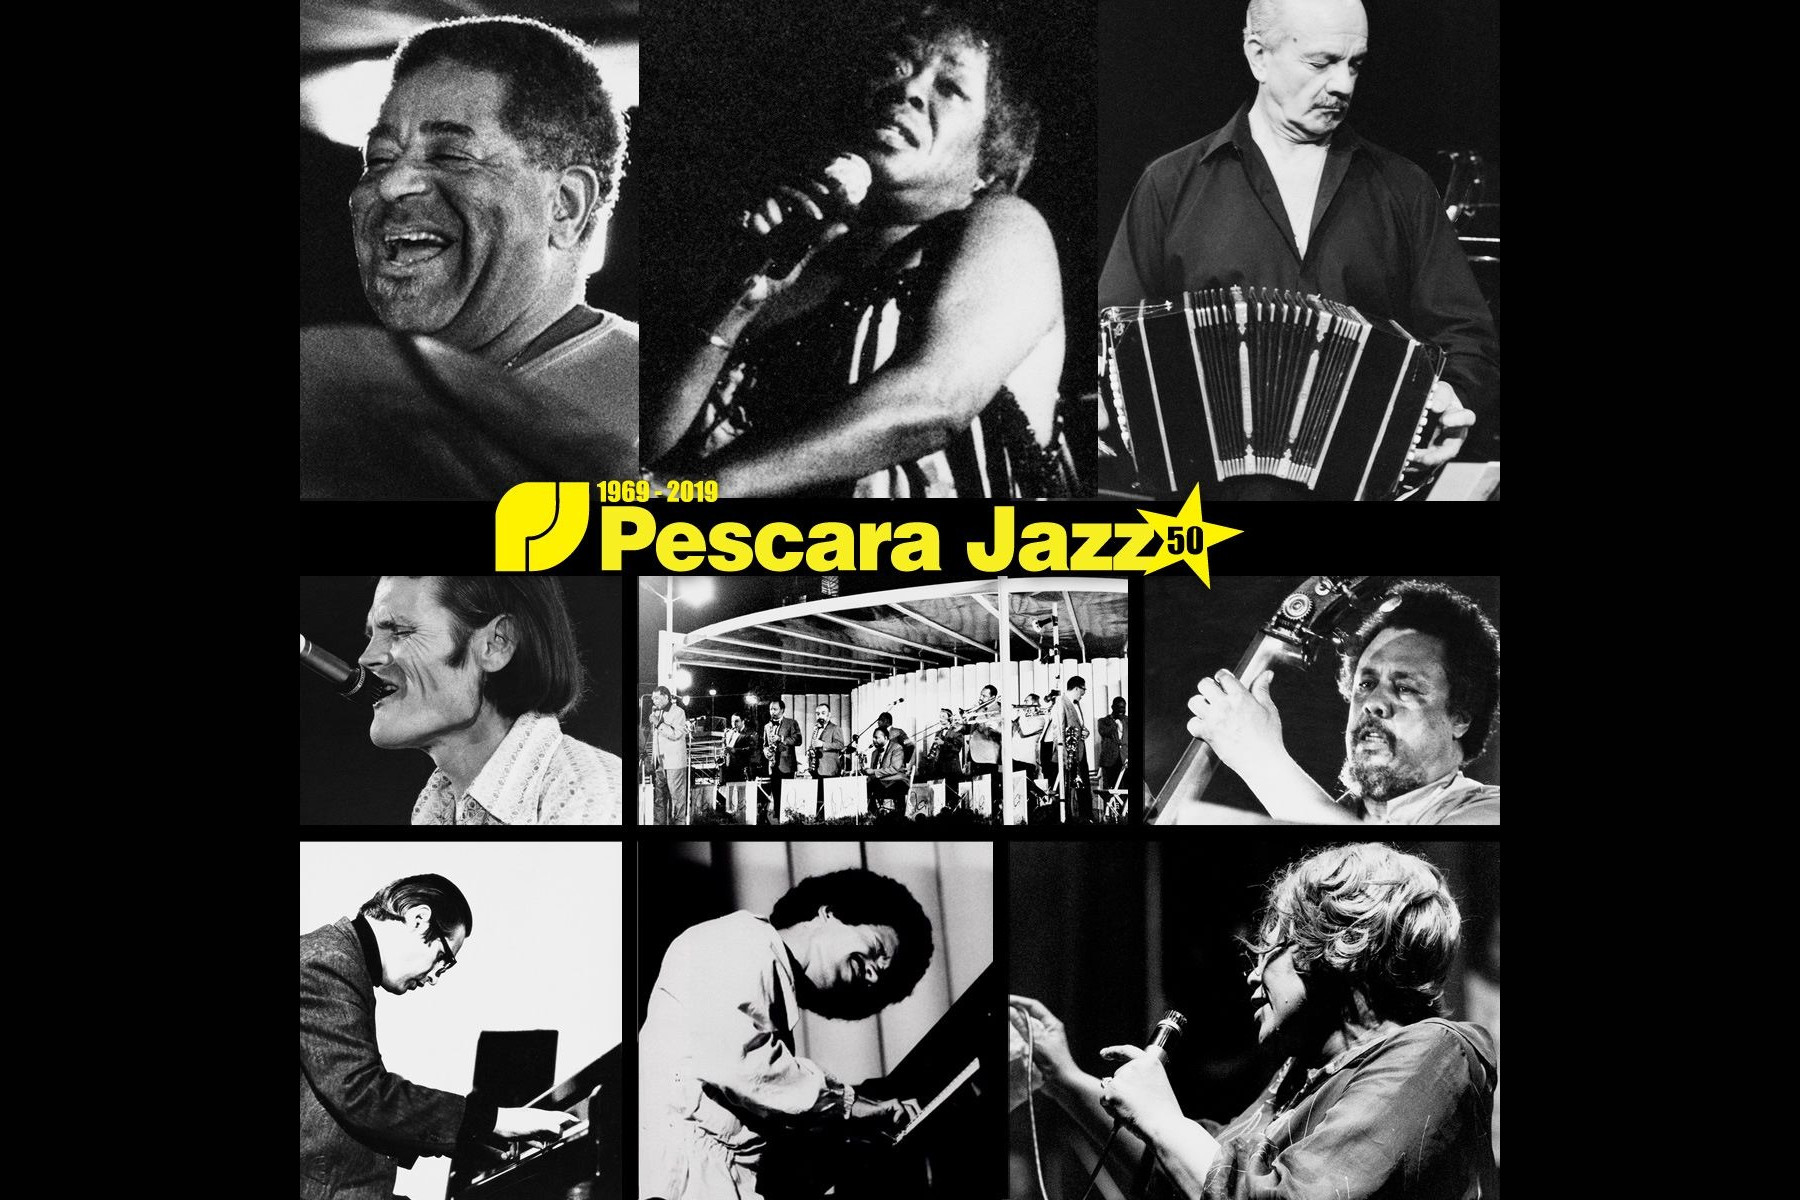 I 50 anni di Pescara Jazz